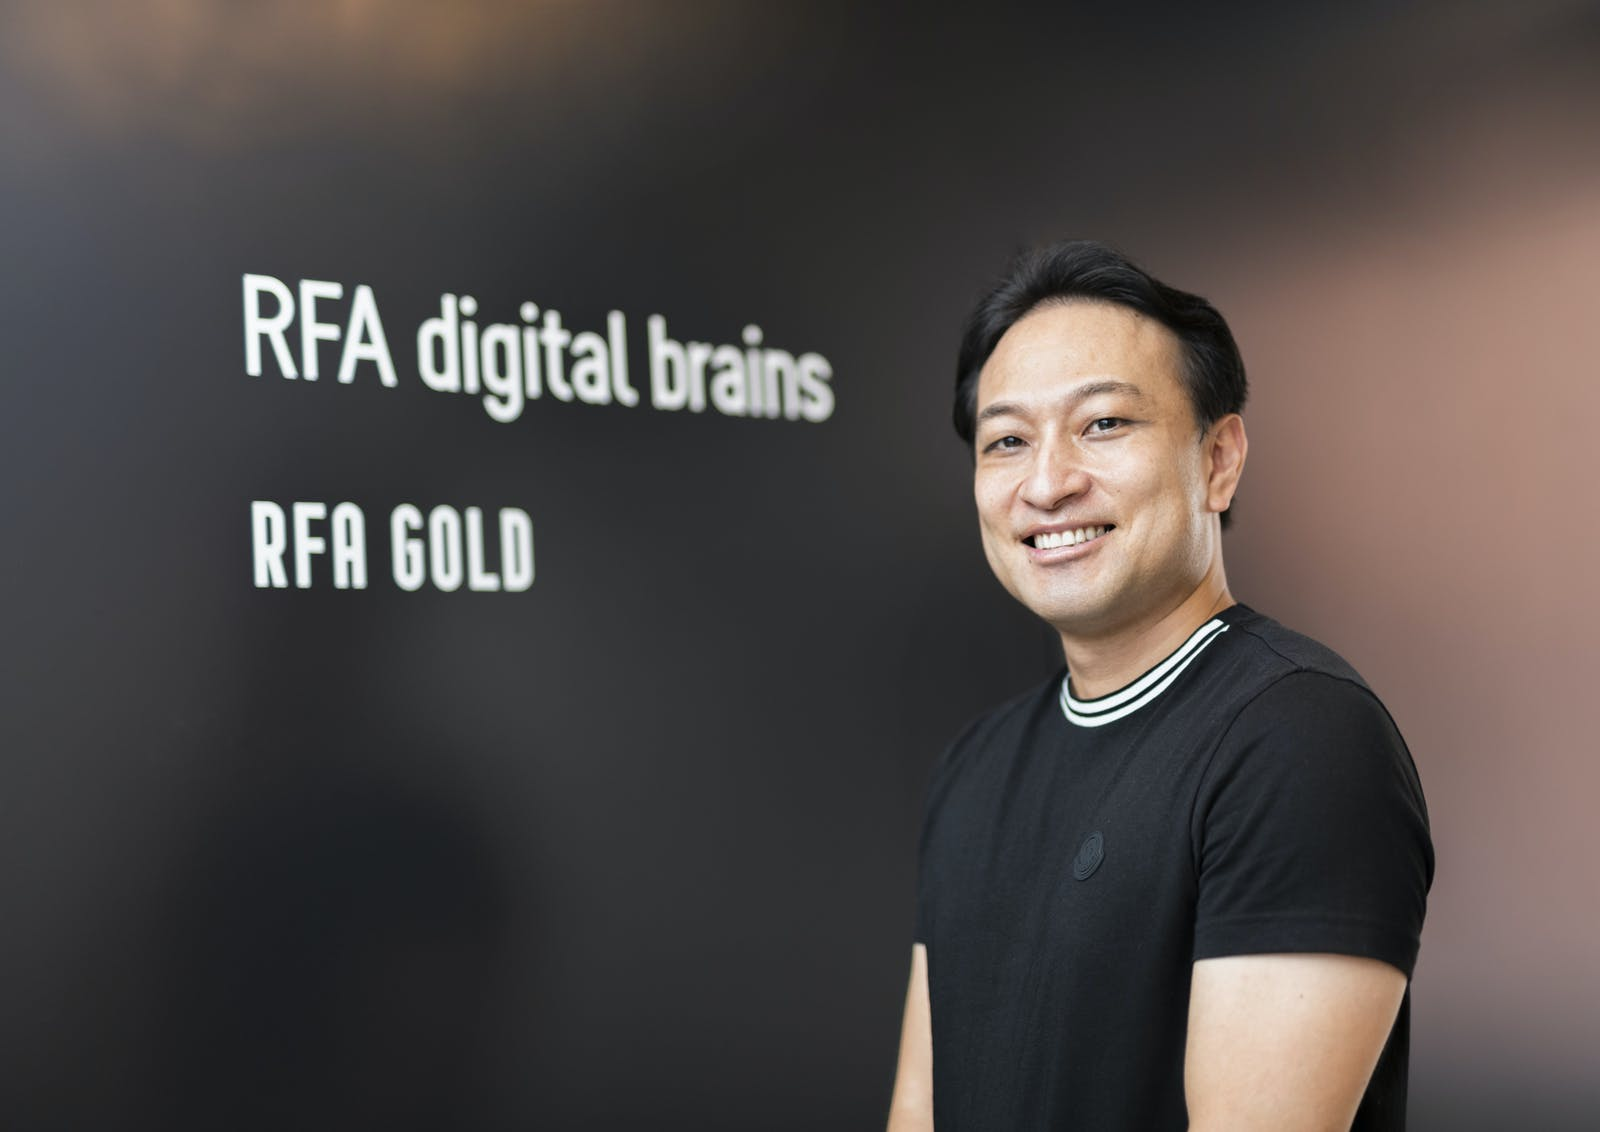 RFA digital brains株式会社のアイキャッチ画像